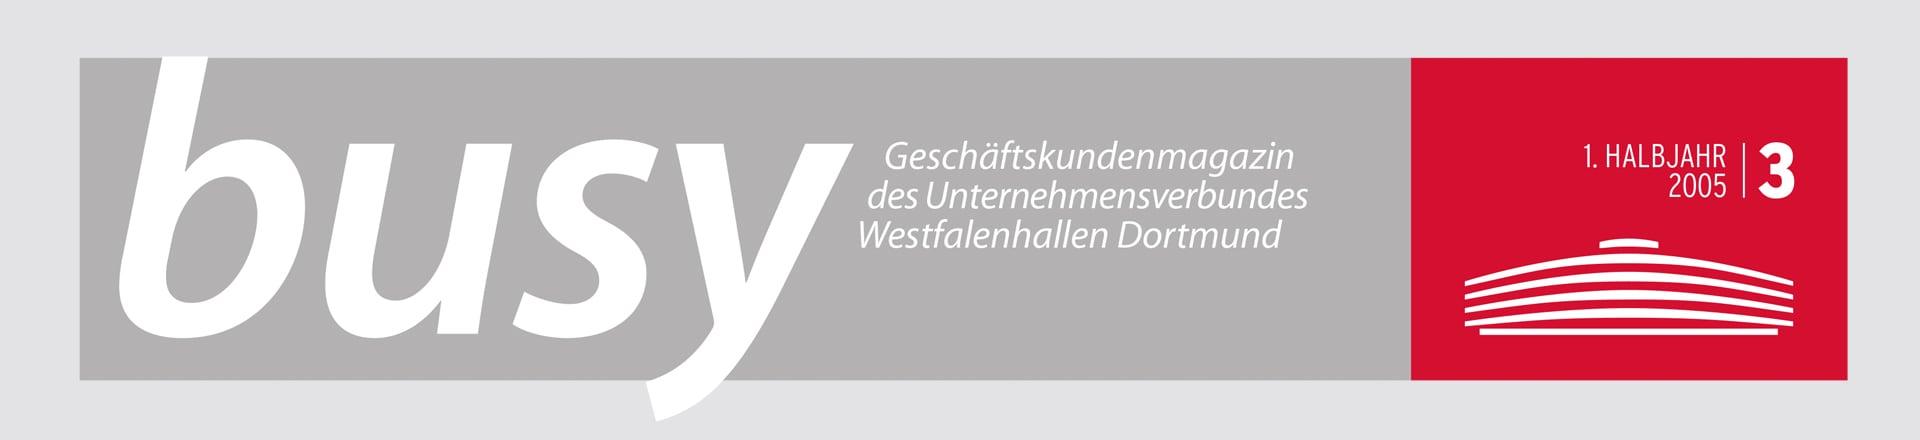 Logo Entwurf für das busy Magazin